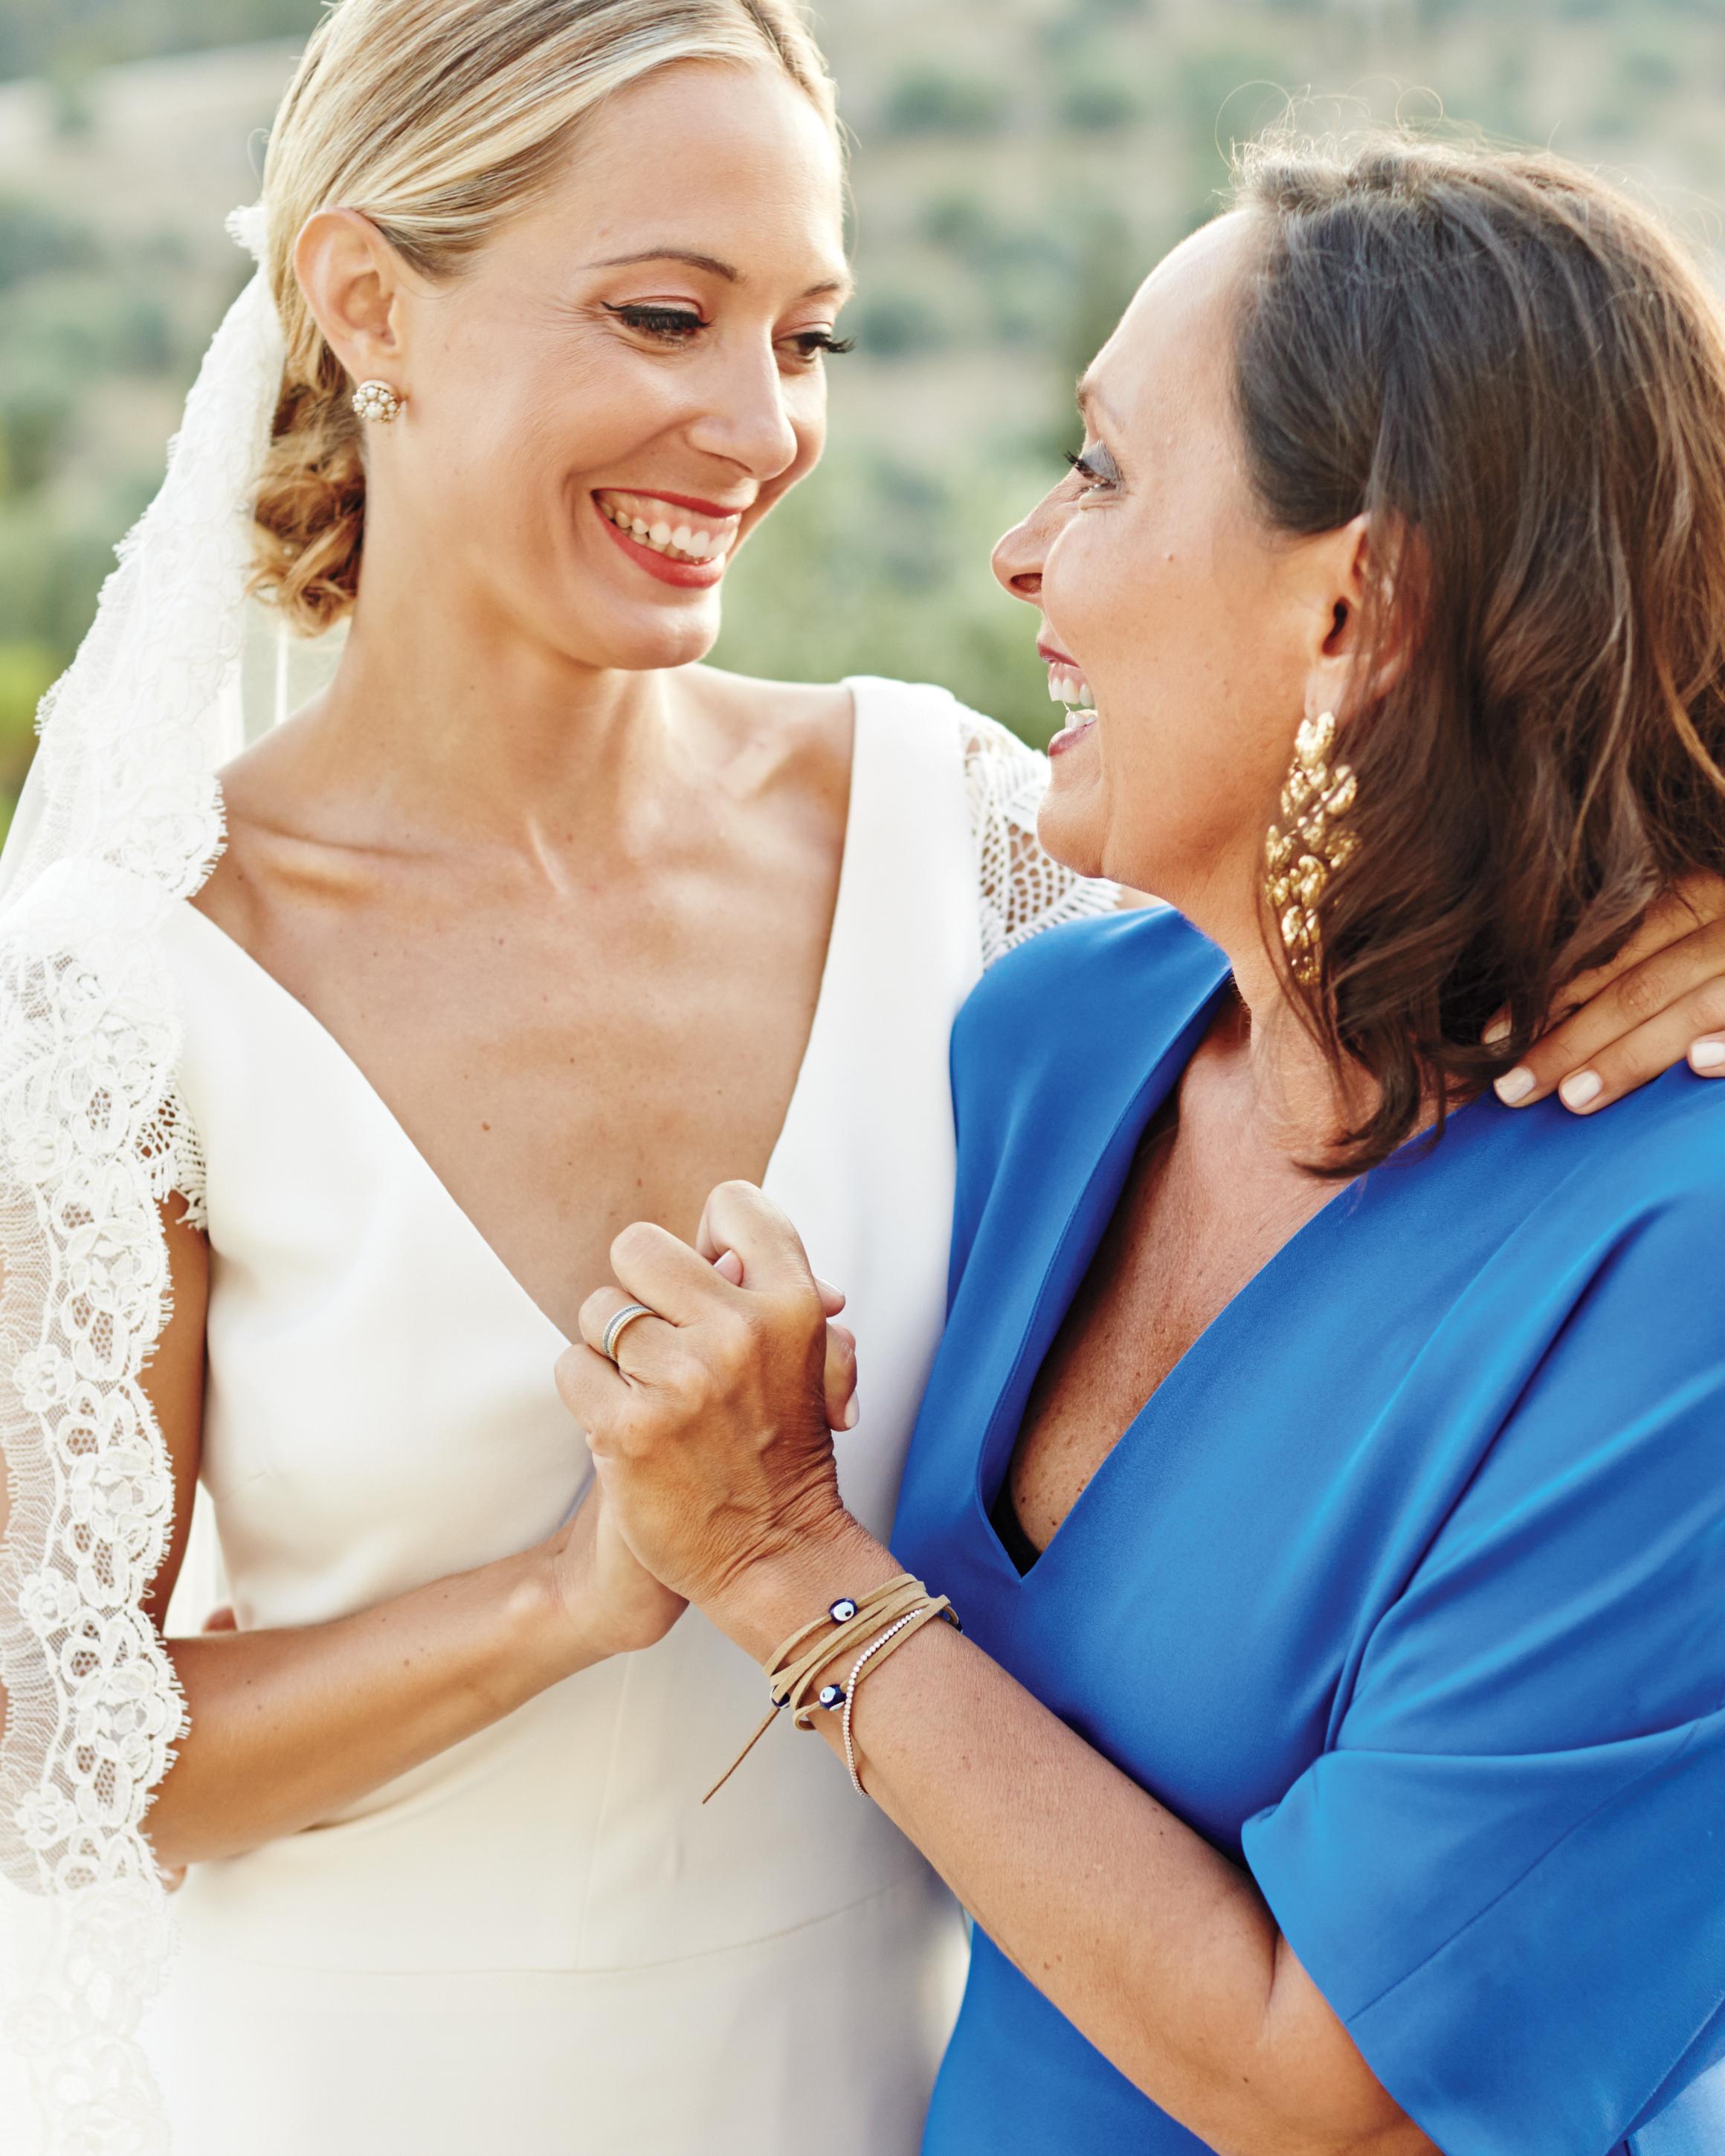 ana-alden-wedding-greece-611a4318-s111821.jpg